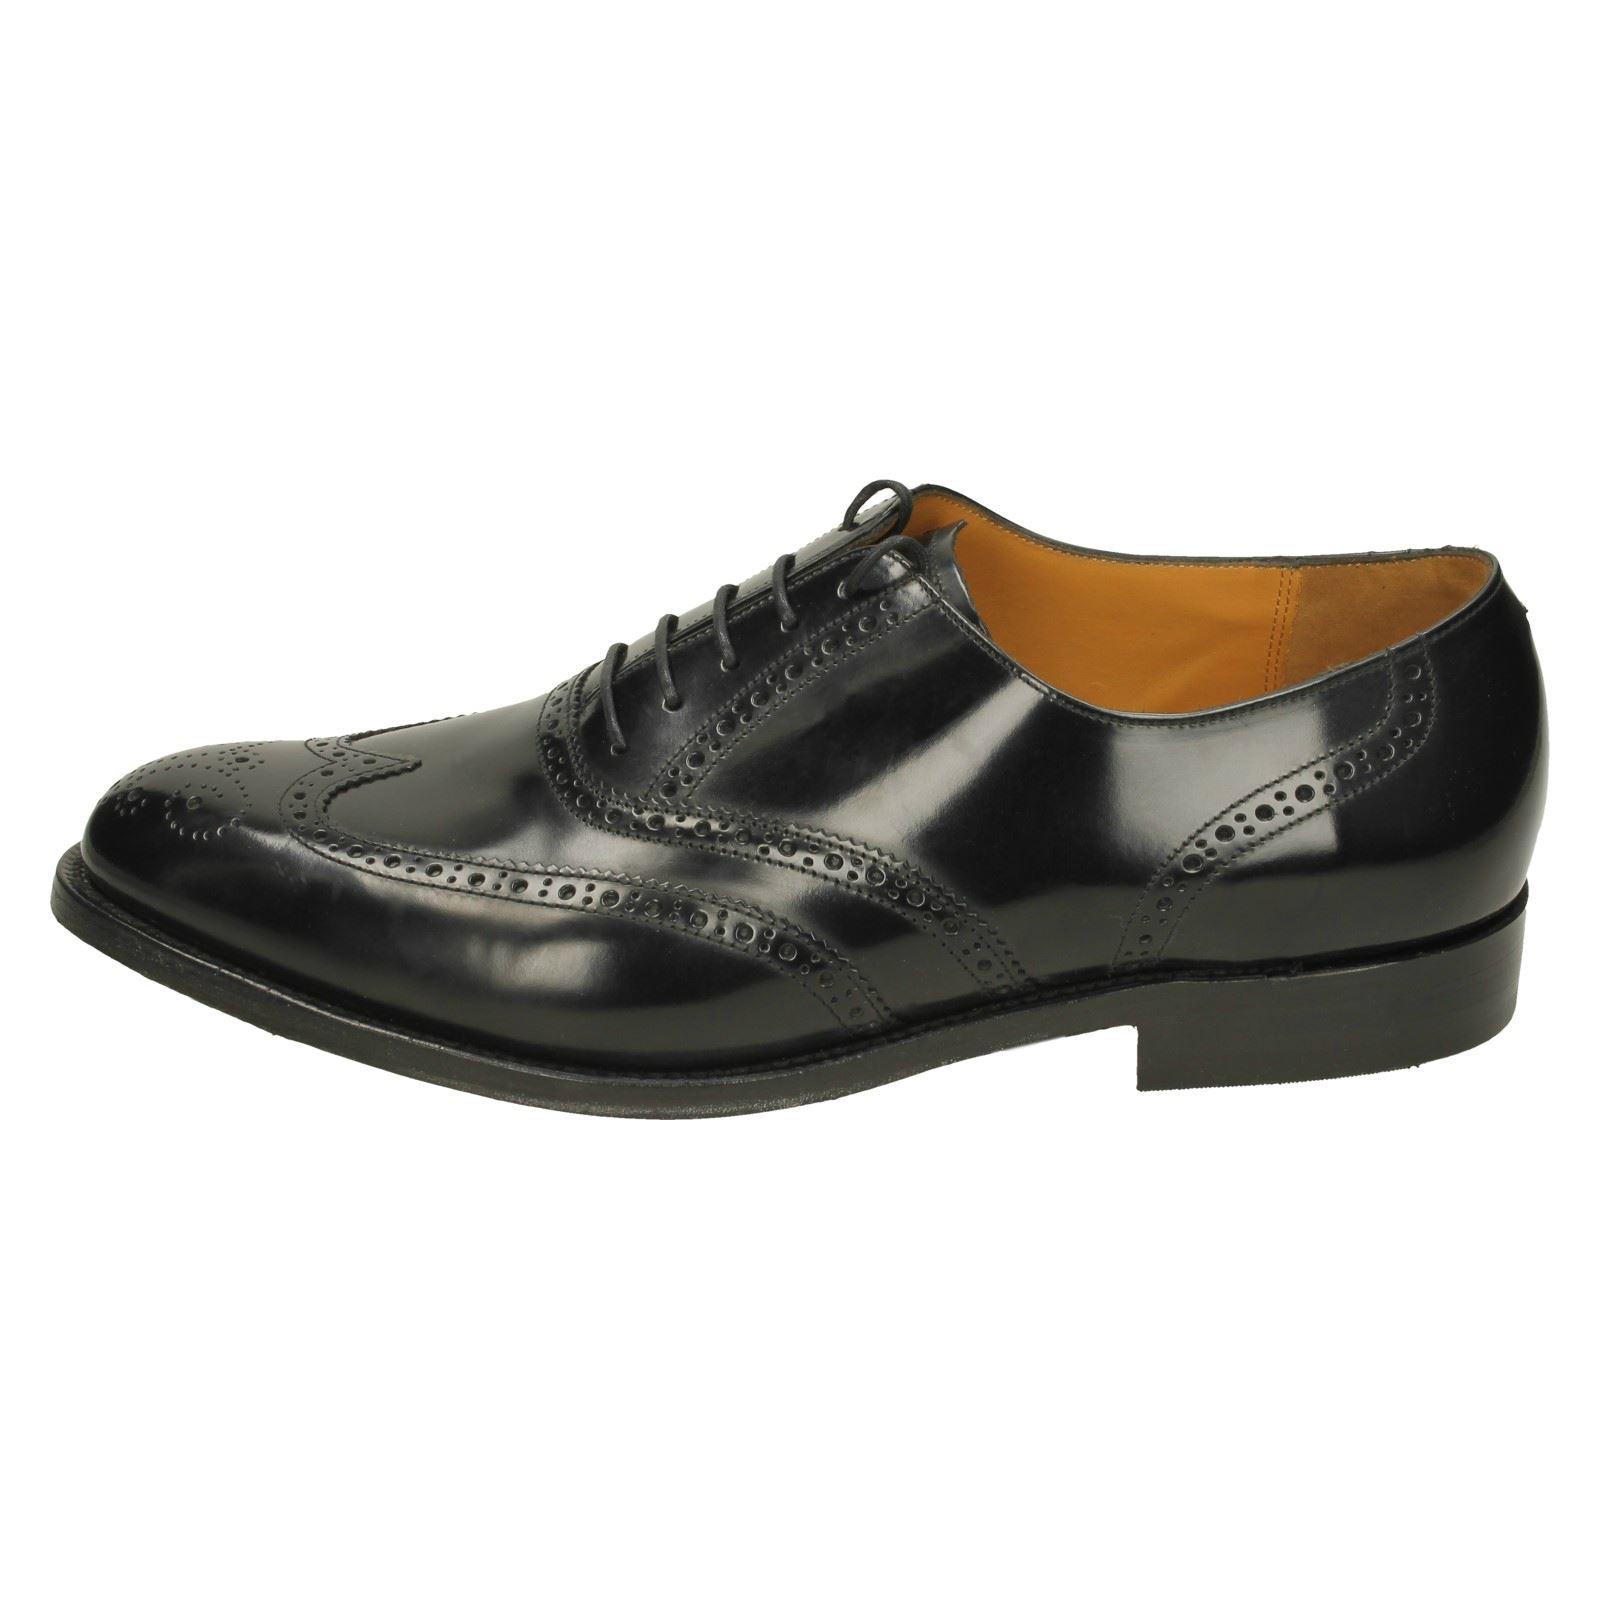 Herren Barker Brogue Style Schuhes Albert 91d341